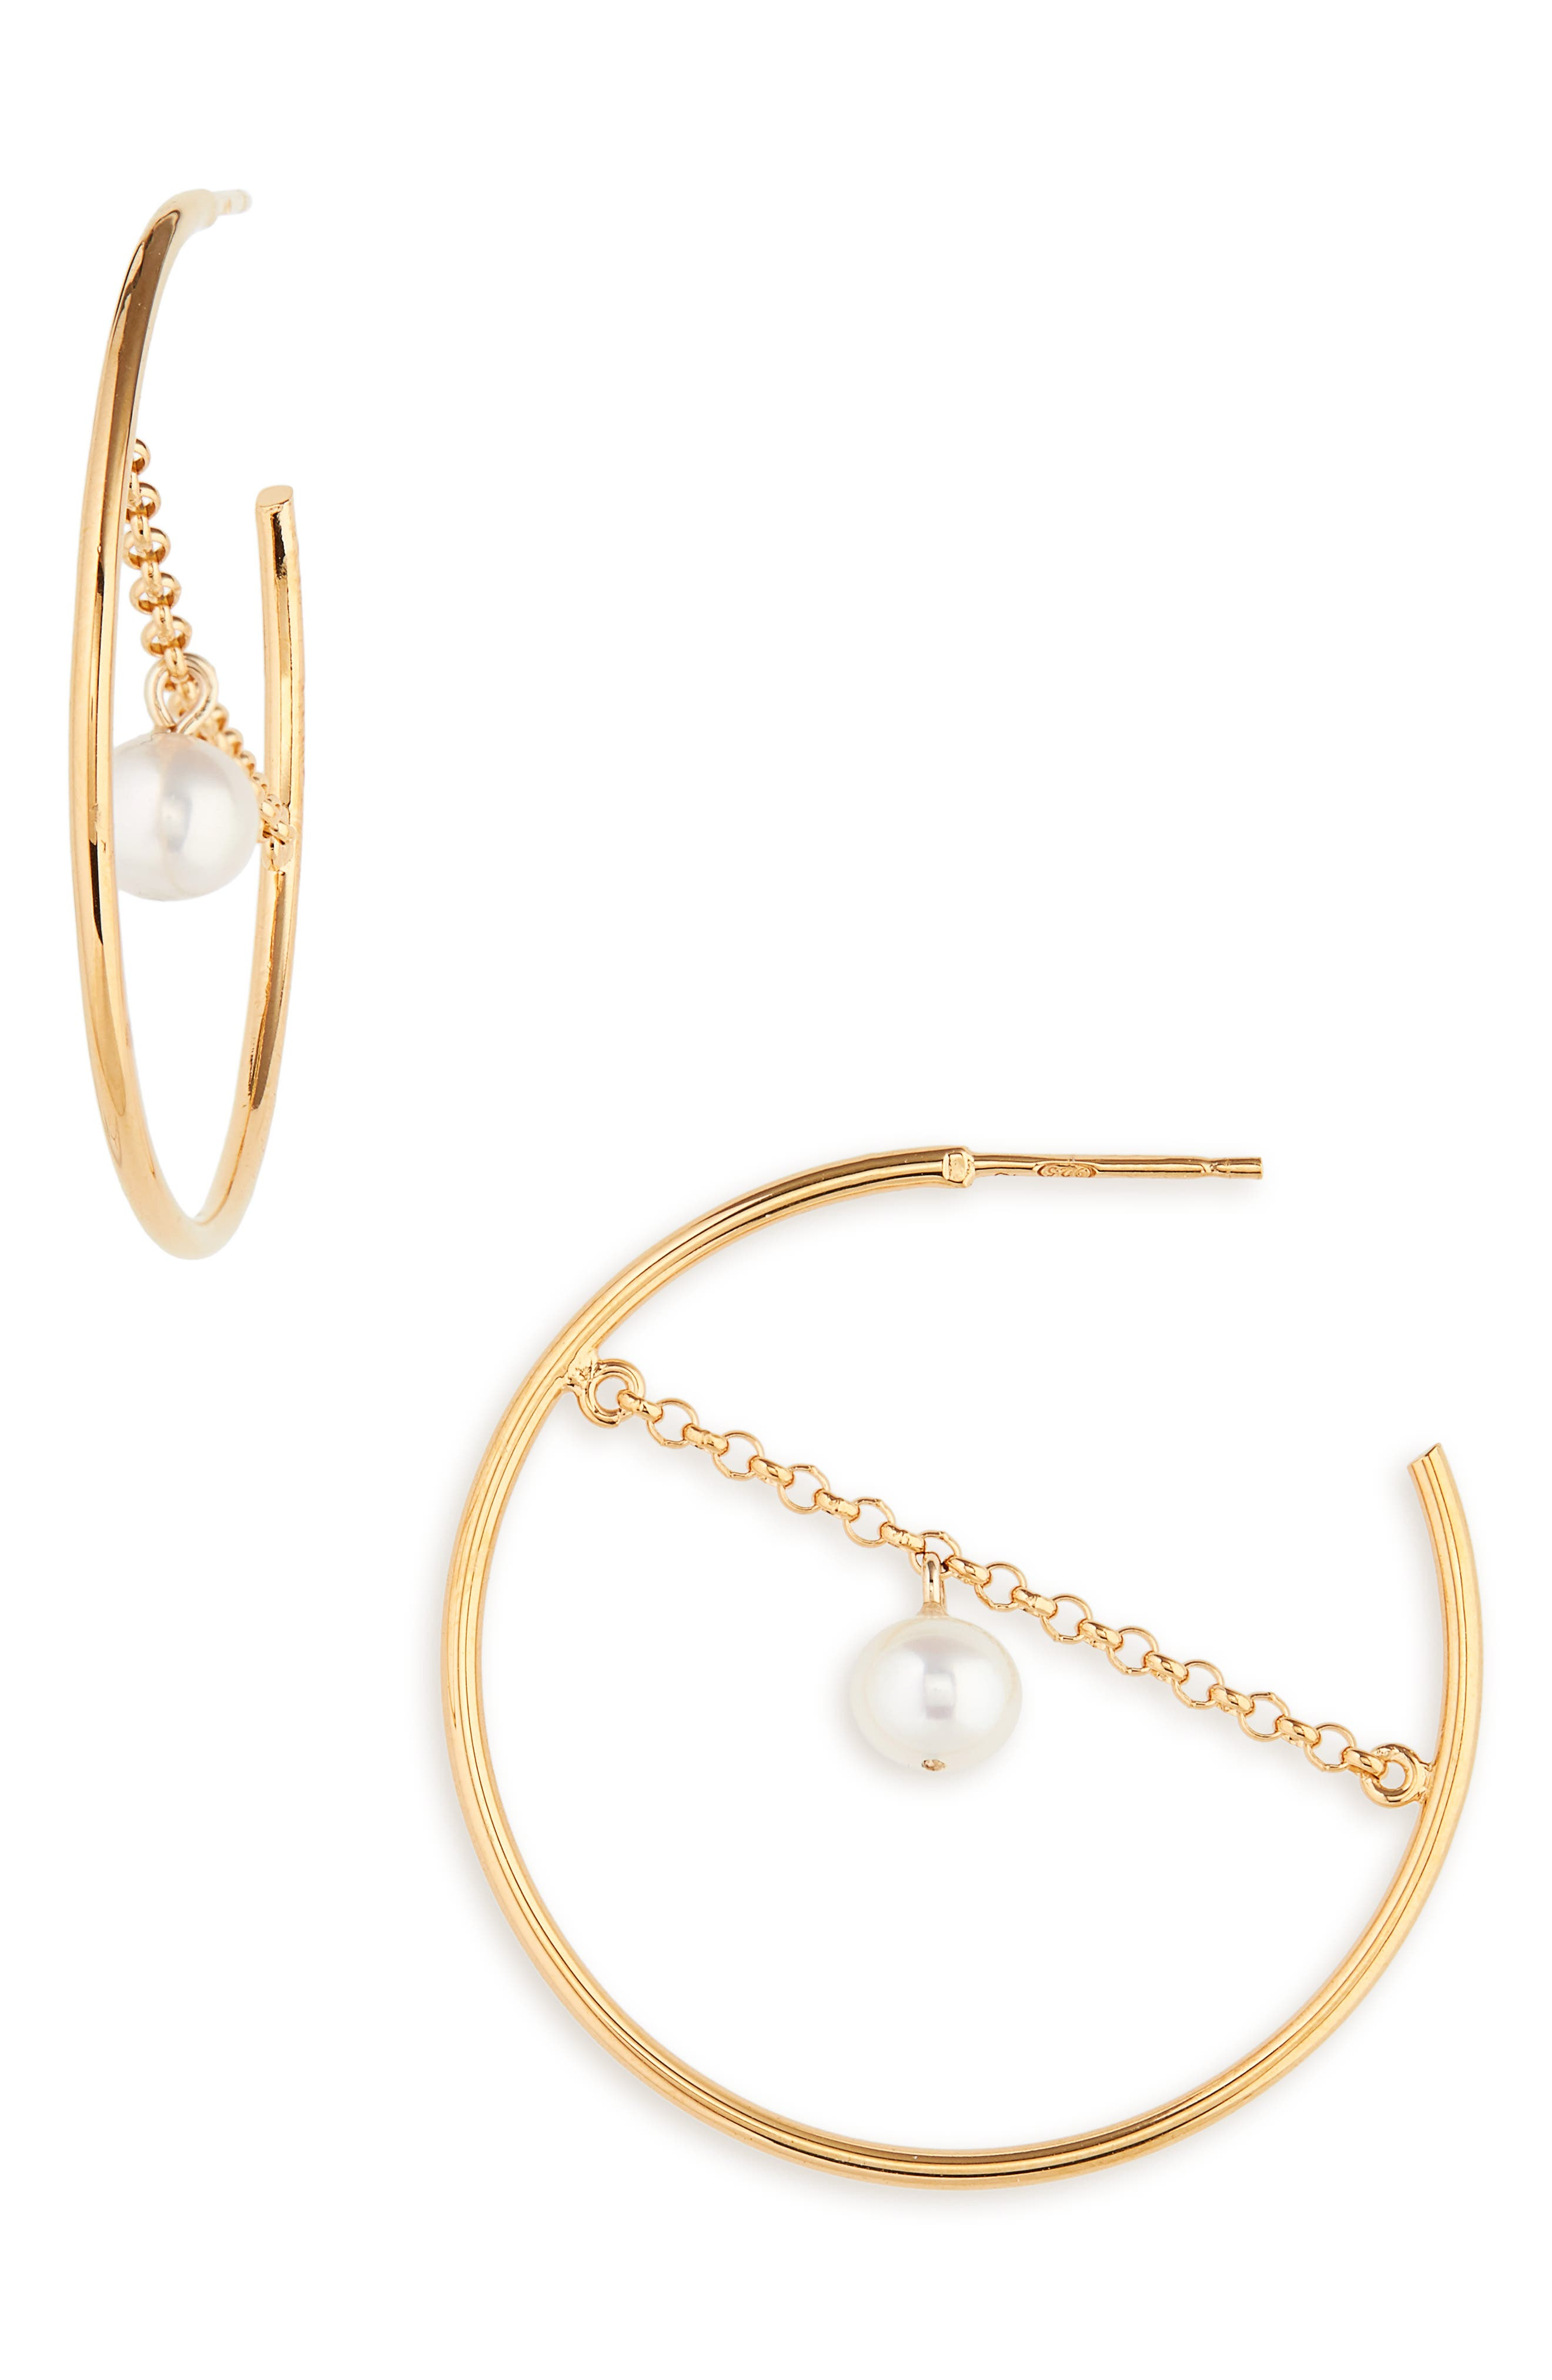 Selene Freshwater Pearl Hoop Earrings,                             Main thumbnail 1, color,                             GOLD PLATED STERLING SILVER